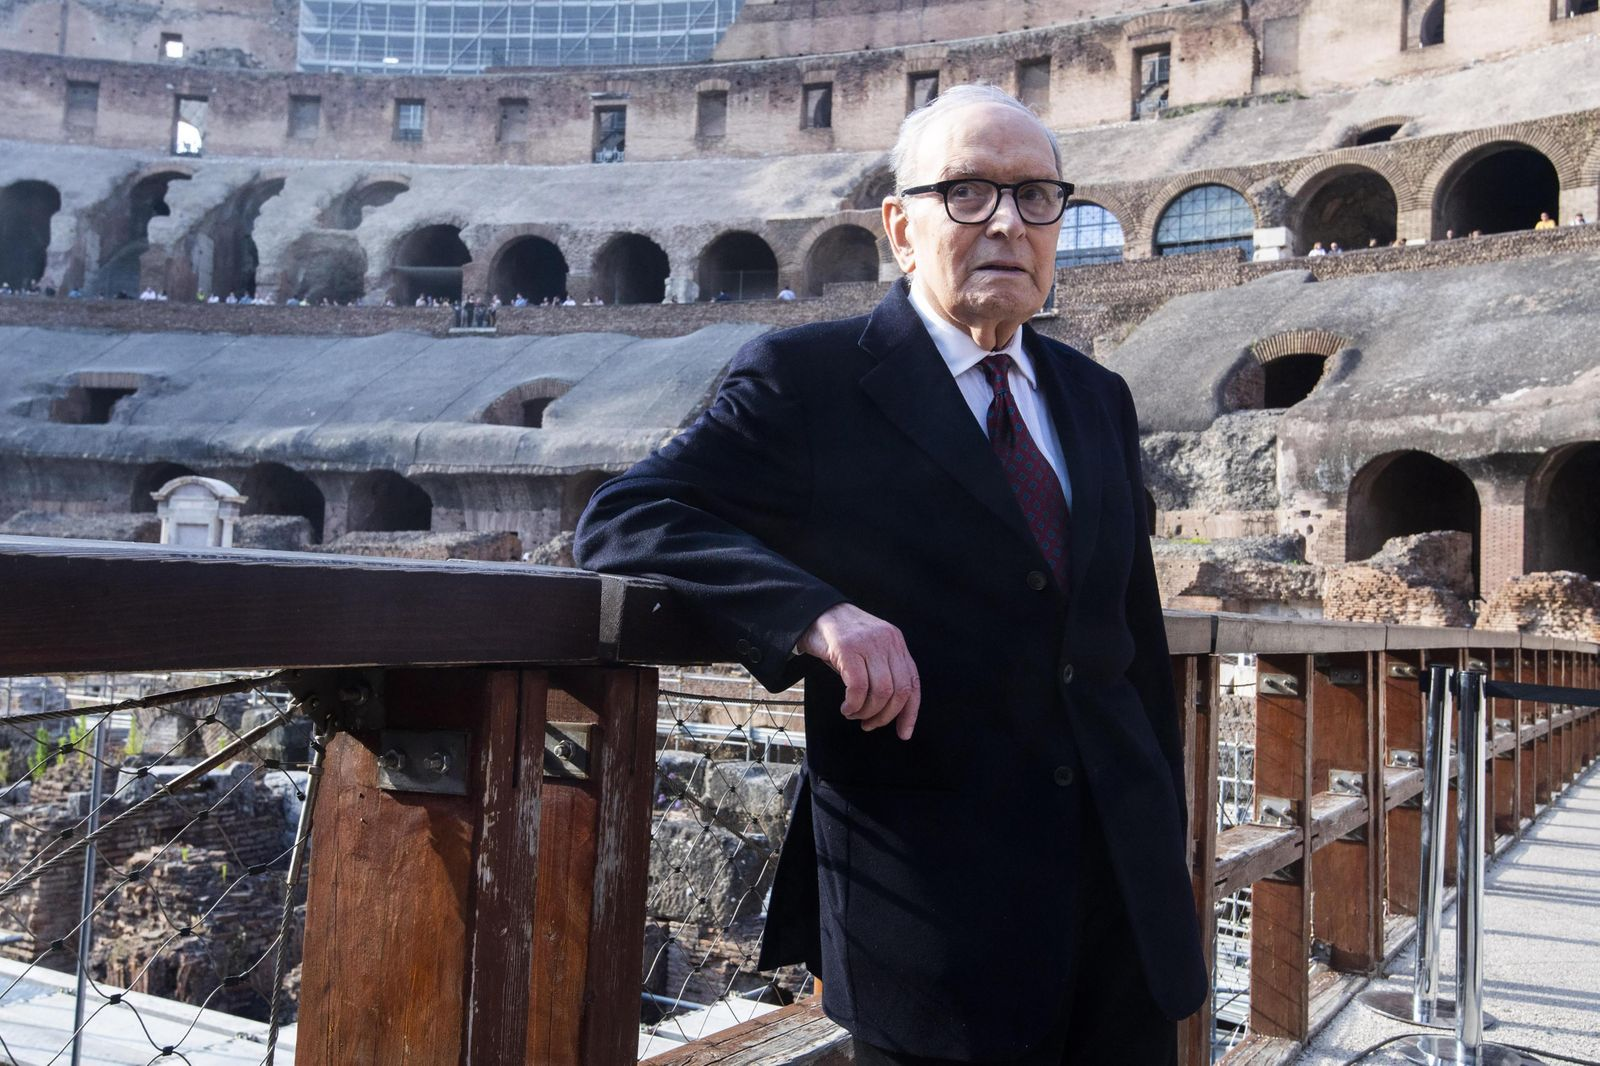 Ennio Morricone awarded in Rome